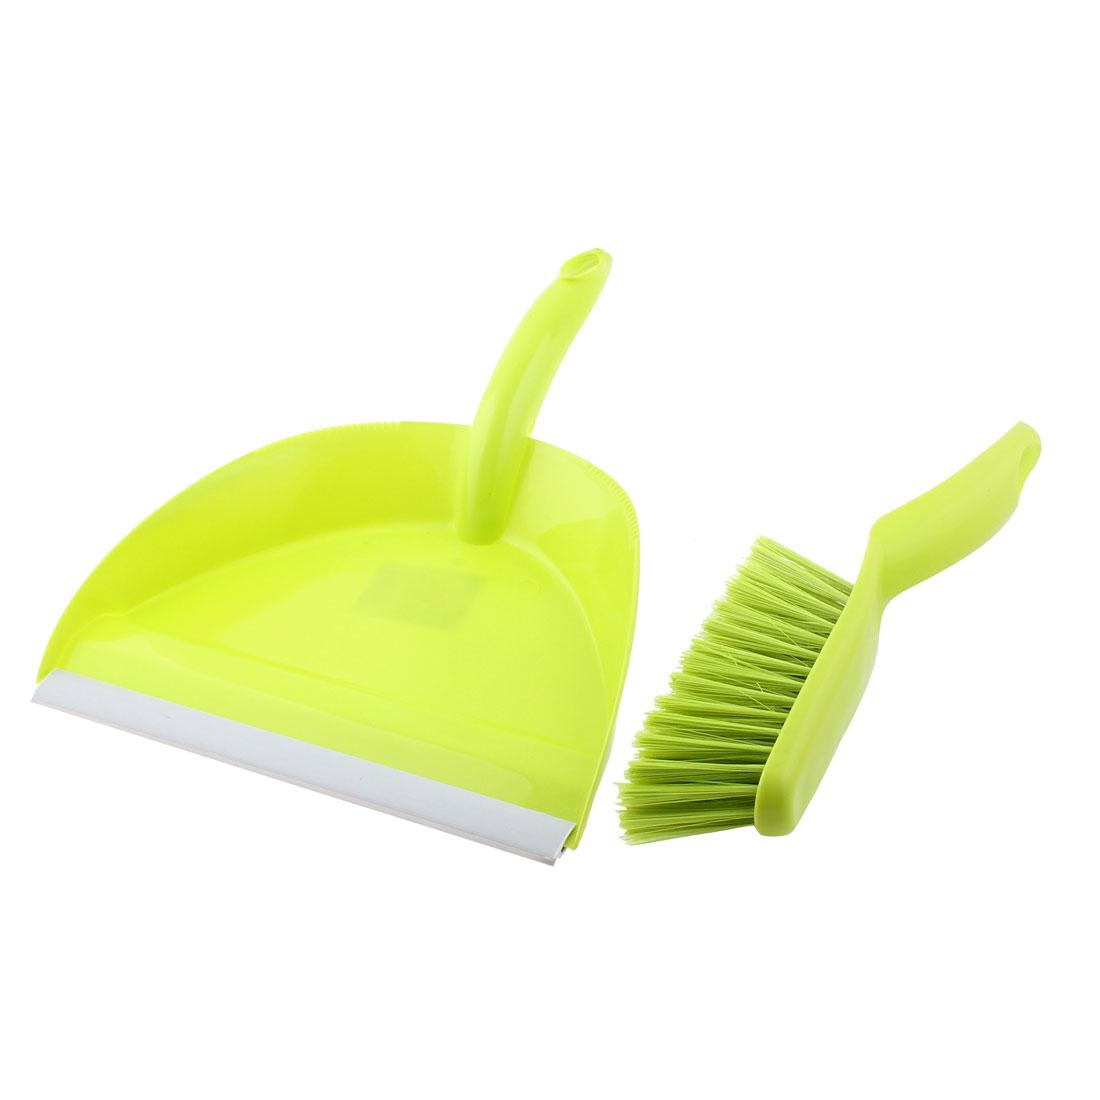 Home Computer Keyboard Desktop Car Plastic Mini Cleaning Broom Dustpan Set Green